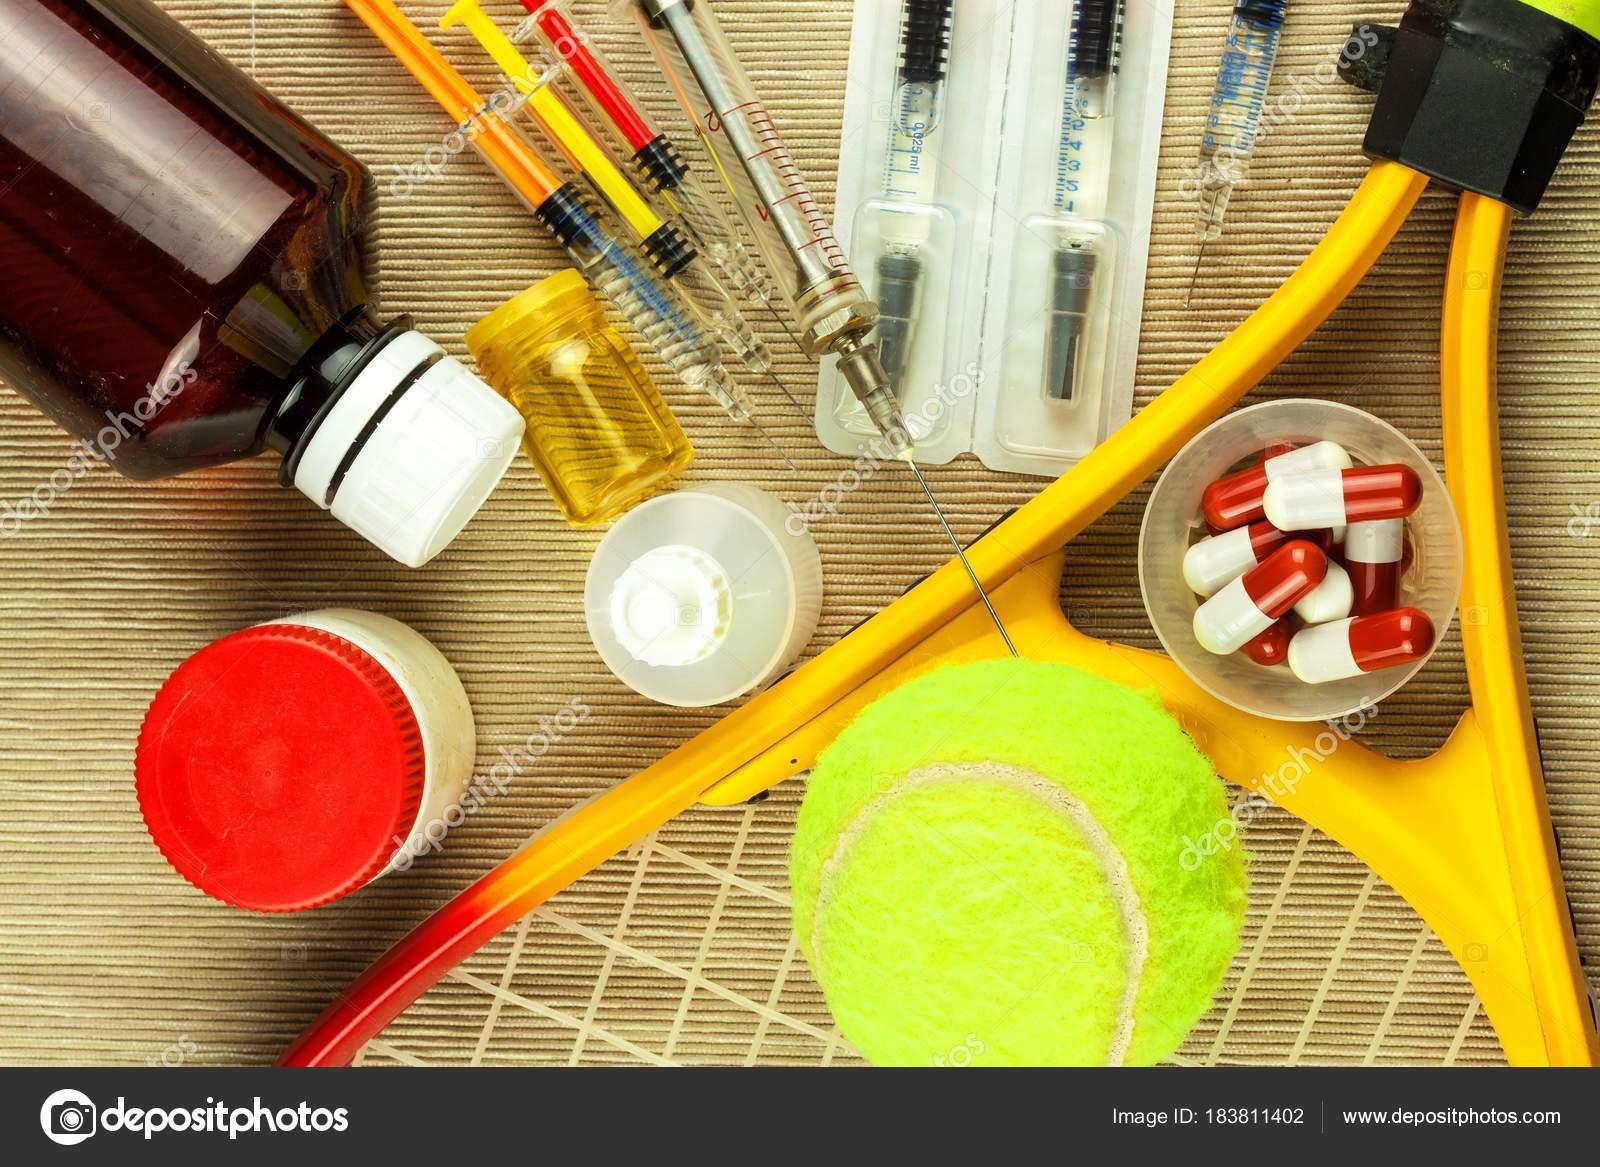 Анаболические стероиды.скачать болденон 300 олимп